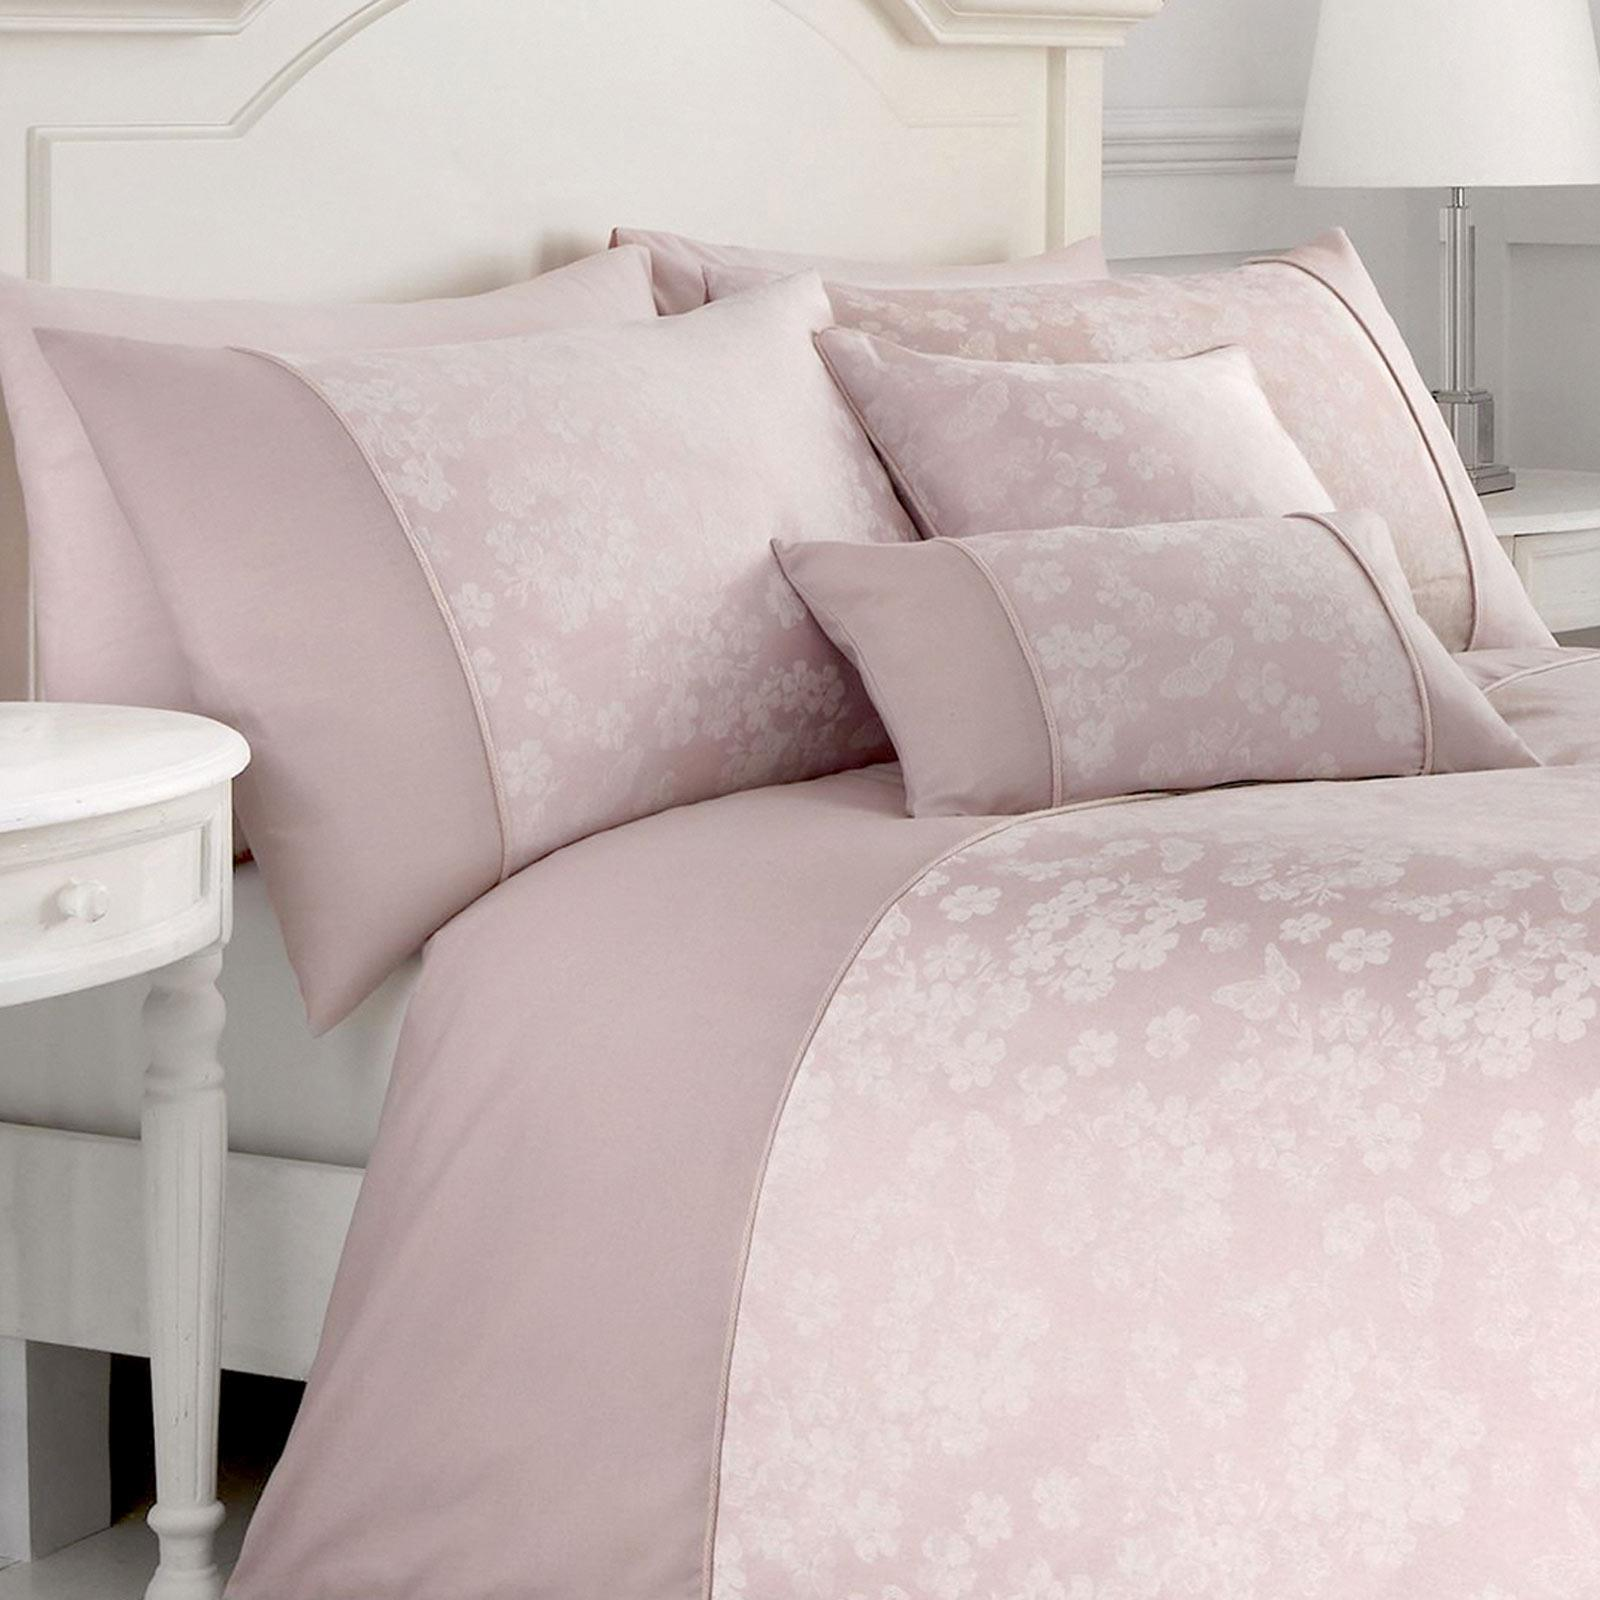 Fundas-de-Edredon-Rosa-Blush-Jacquard-Floral-Cubierta-Del-Edredon-Conjuntos-de-Ropa-de-cama-de-lujo miniatura 9